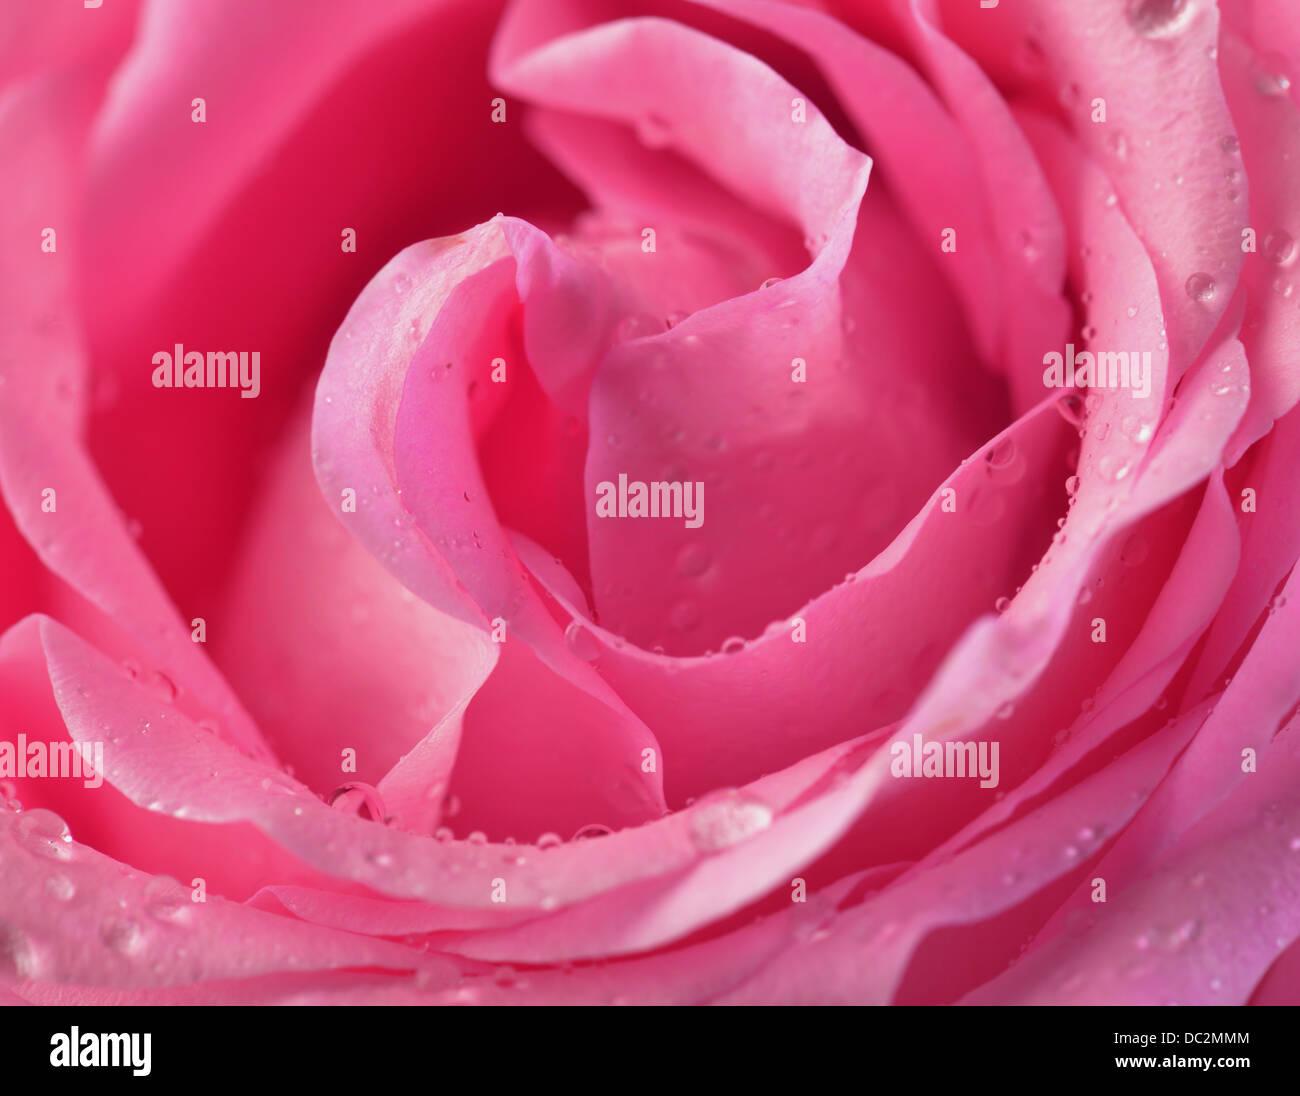 Rosa rosa yema macro con gotas de agua Imagen De Stock